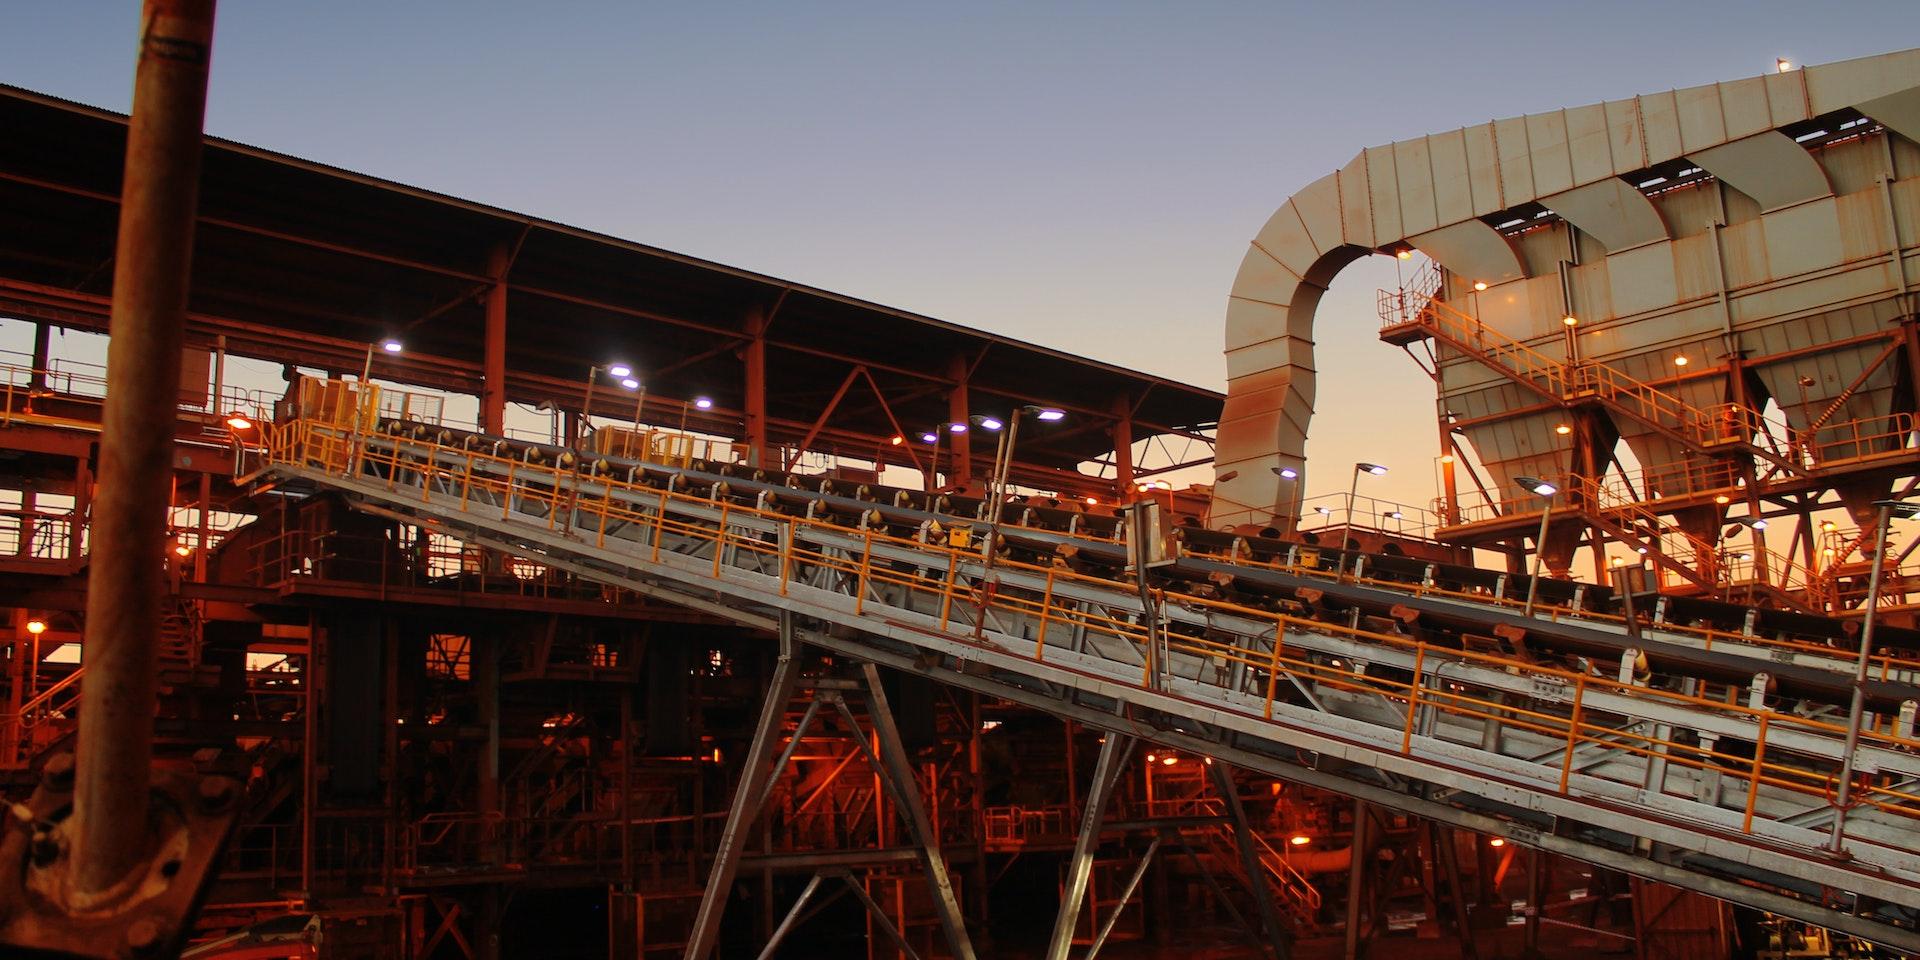 EMDLK2 in application, installed on an industrial conveyor.